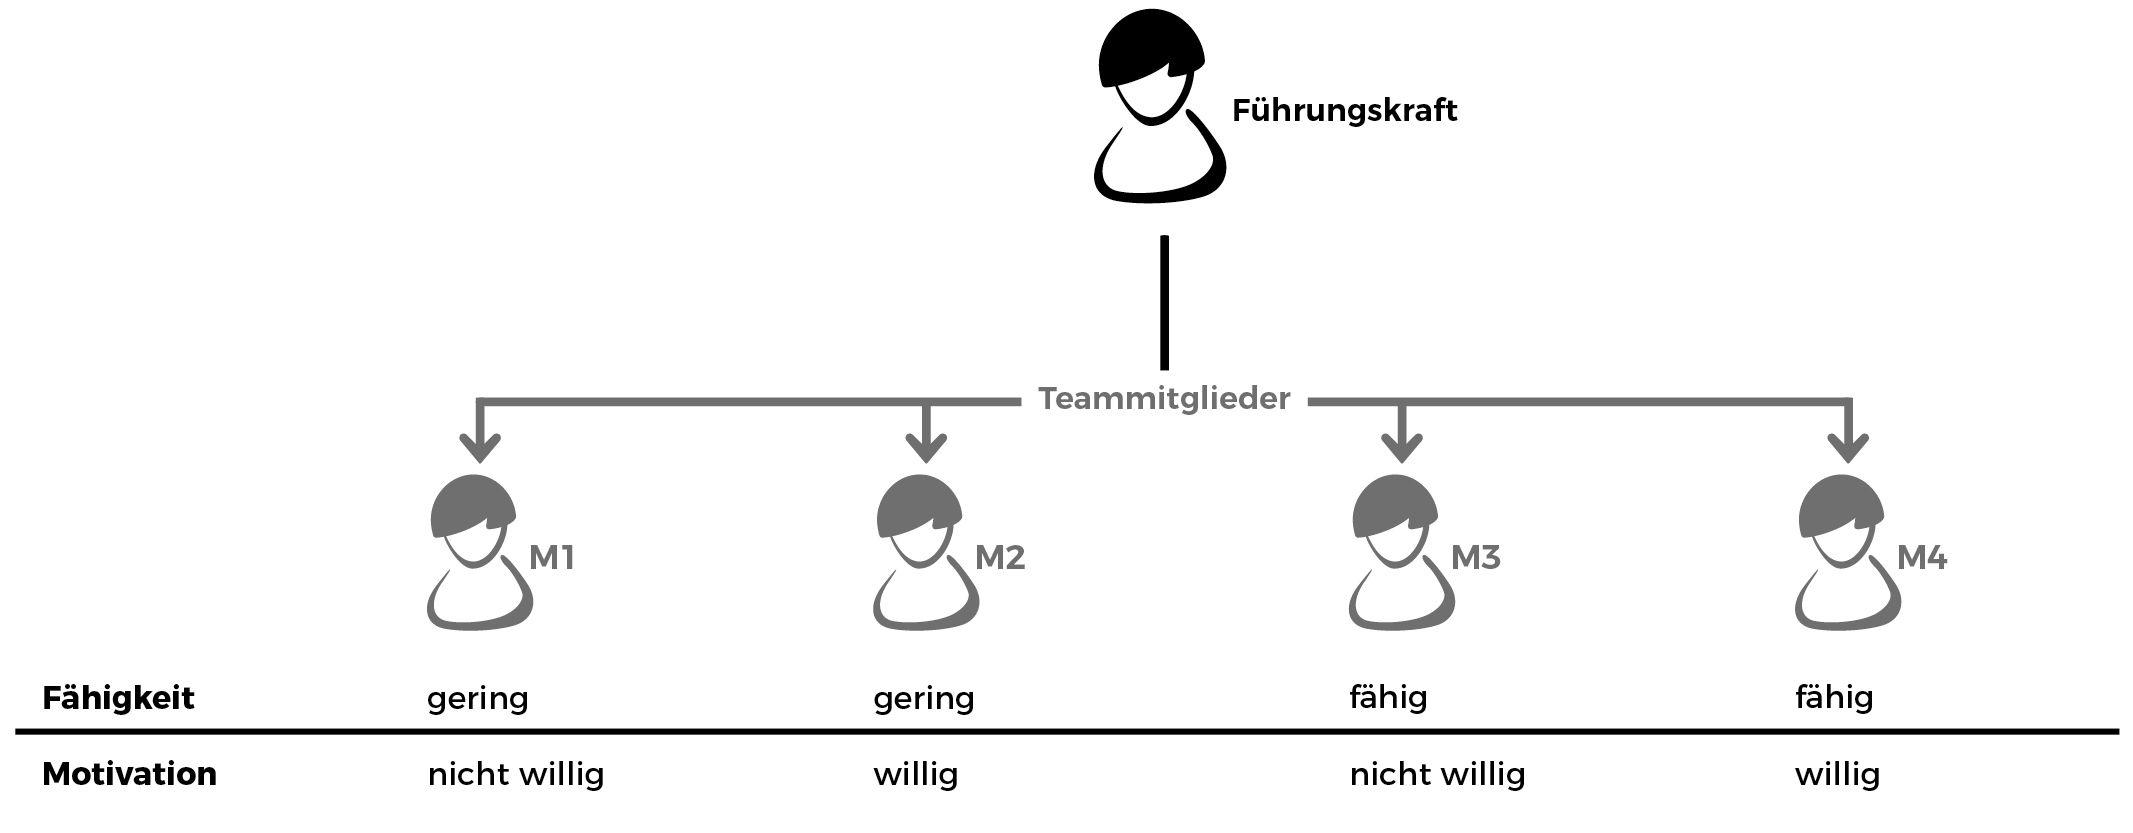 Aufgaben delegieren Reifegrad-Modell